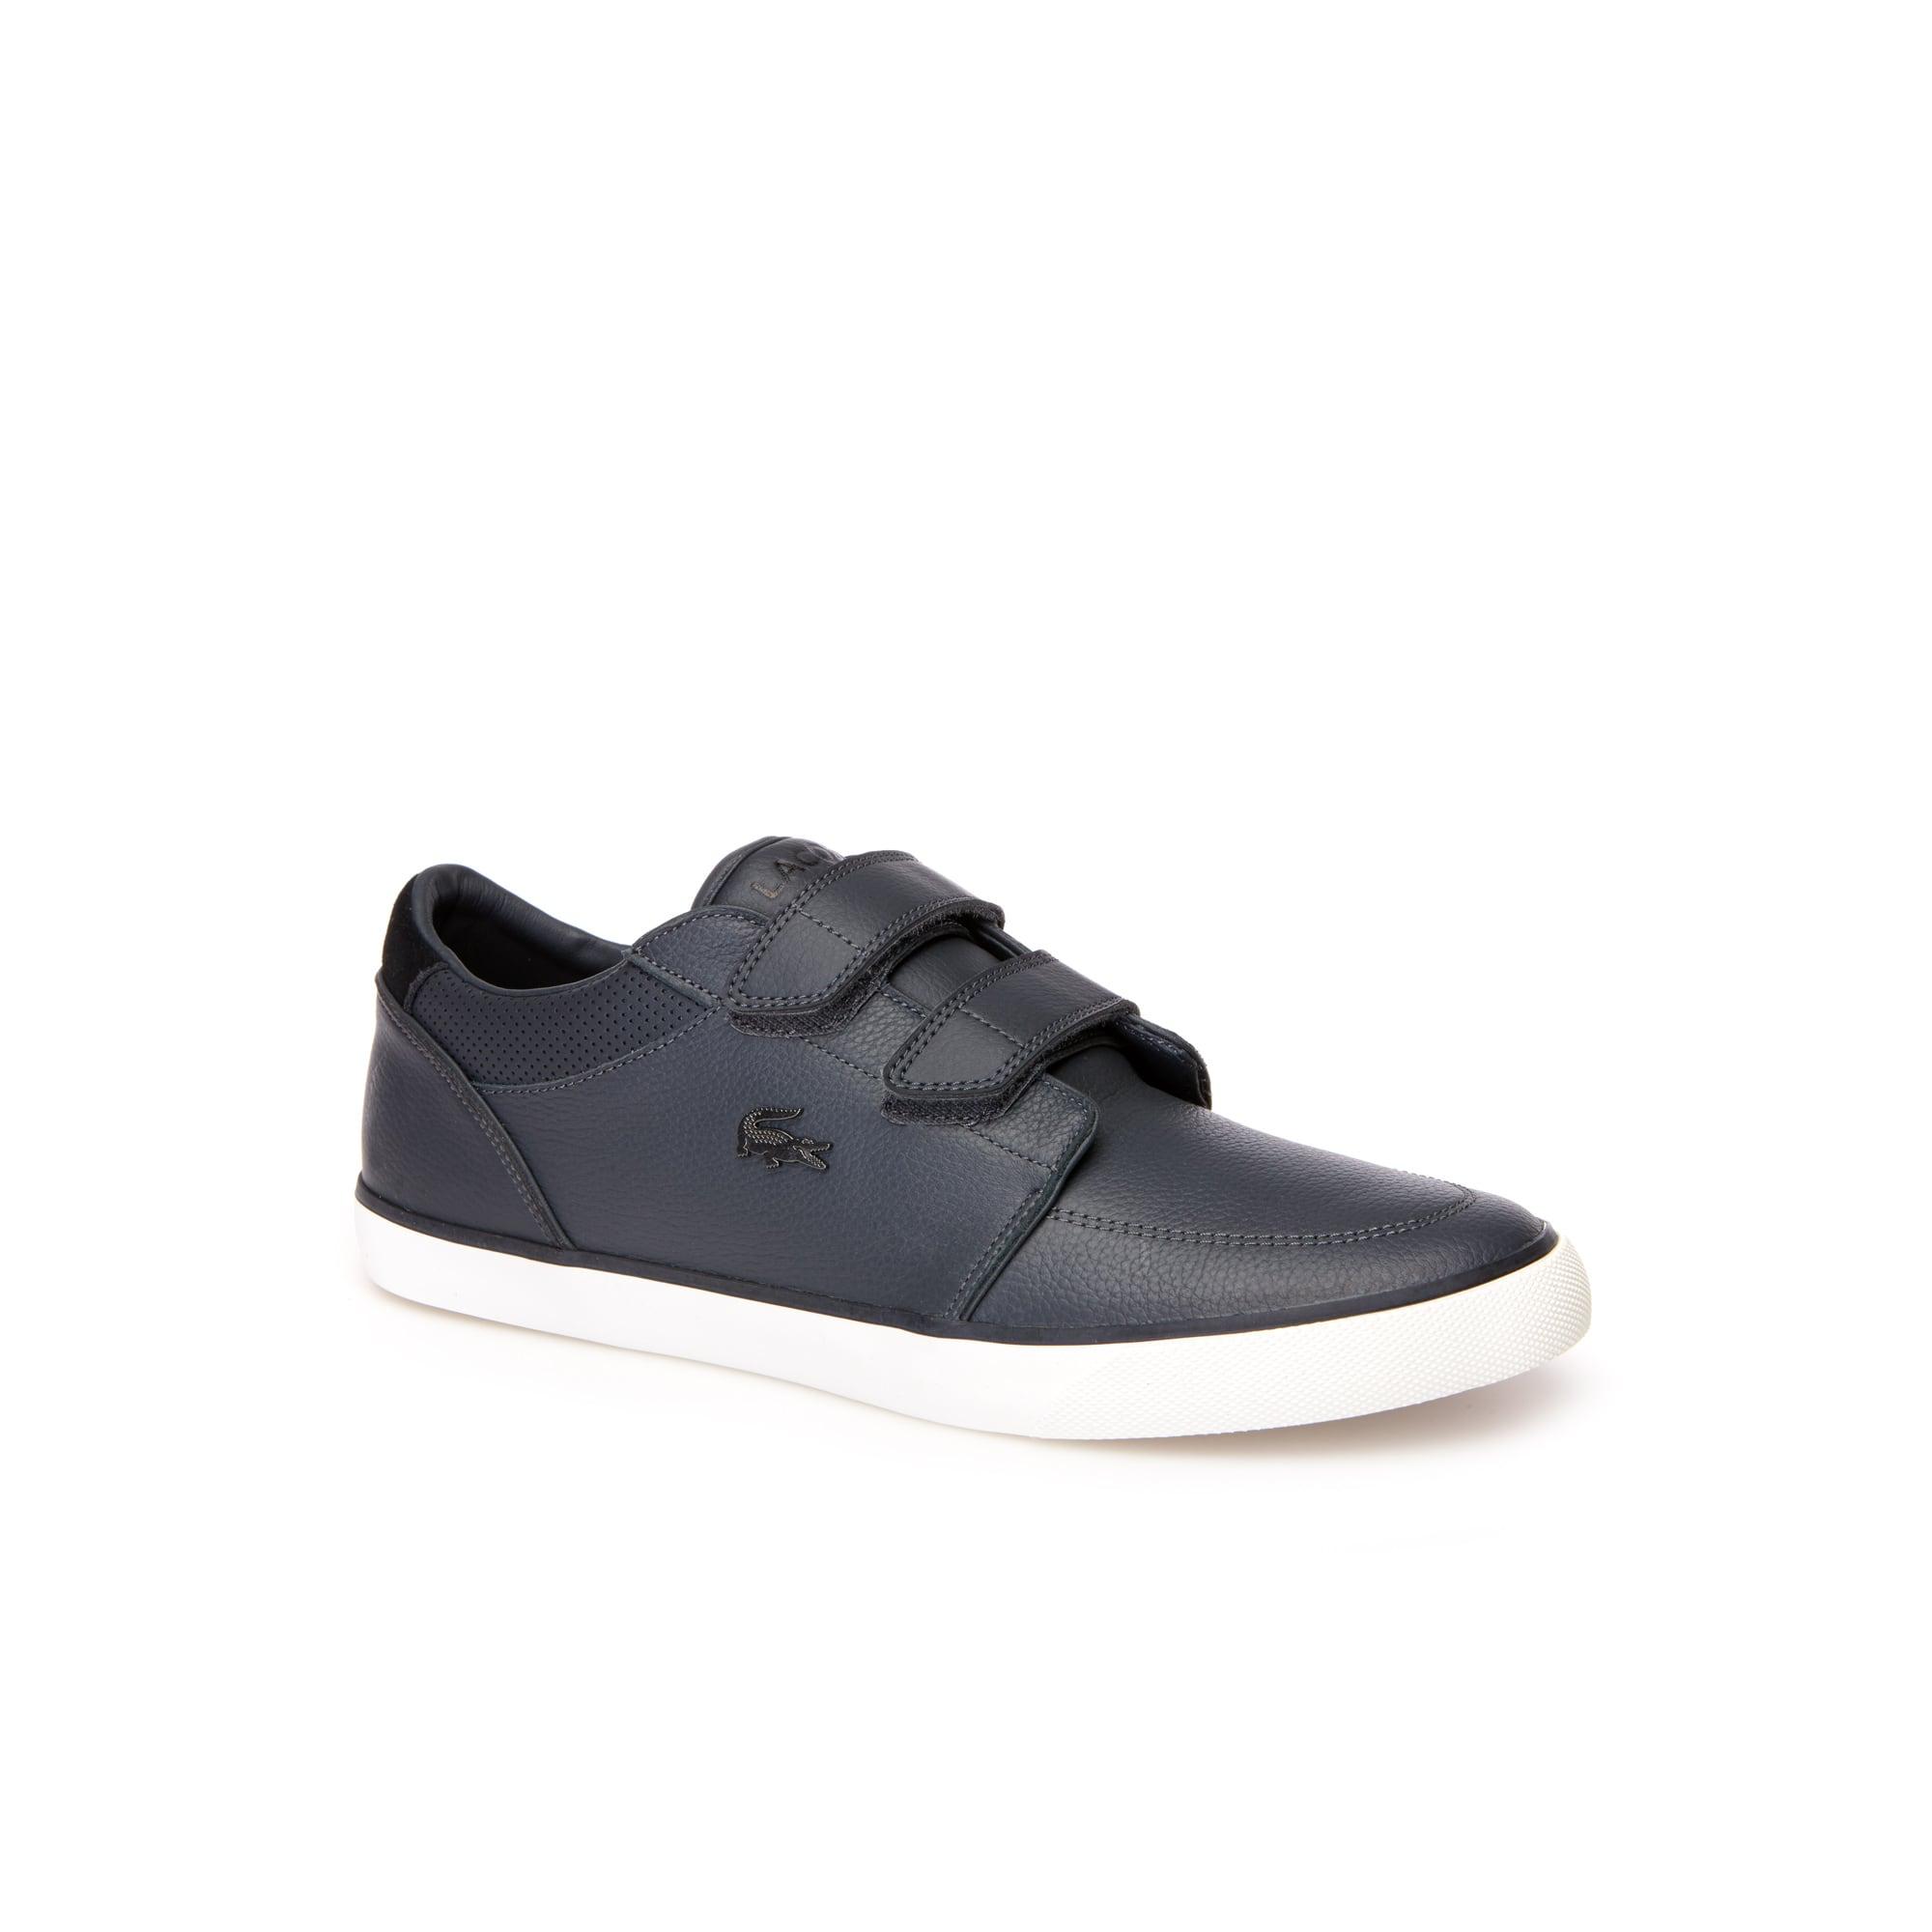 ab47cbf557f7b8 Men s Shoes on Sale